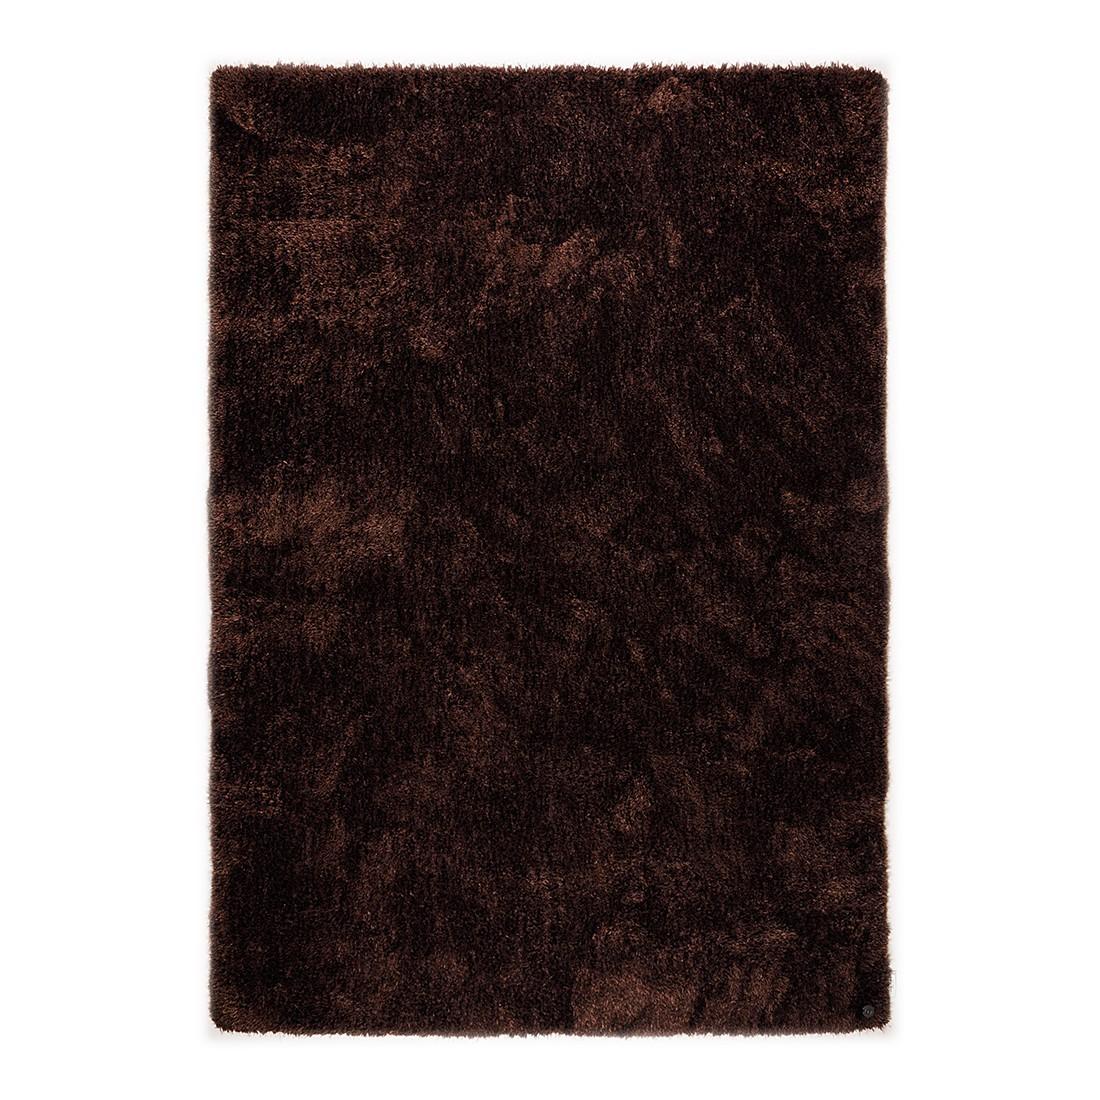 Tapijt Soft Square - chocoladekleurig - maat: 160x230cm, Tom Tailor